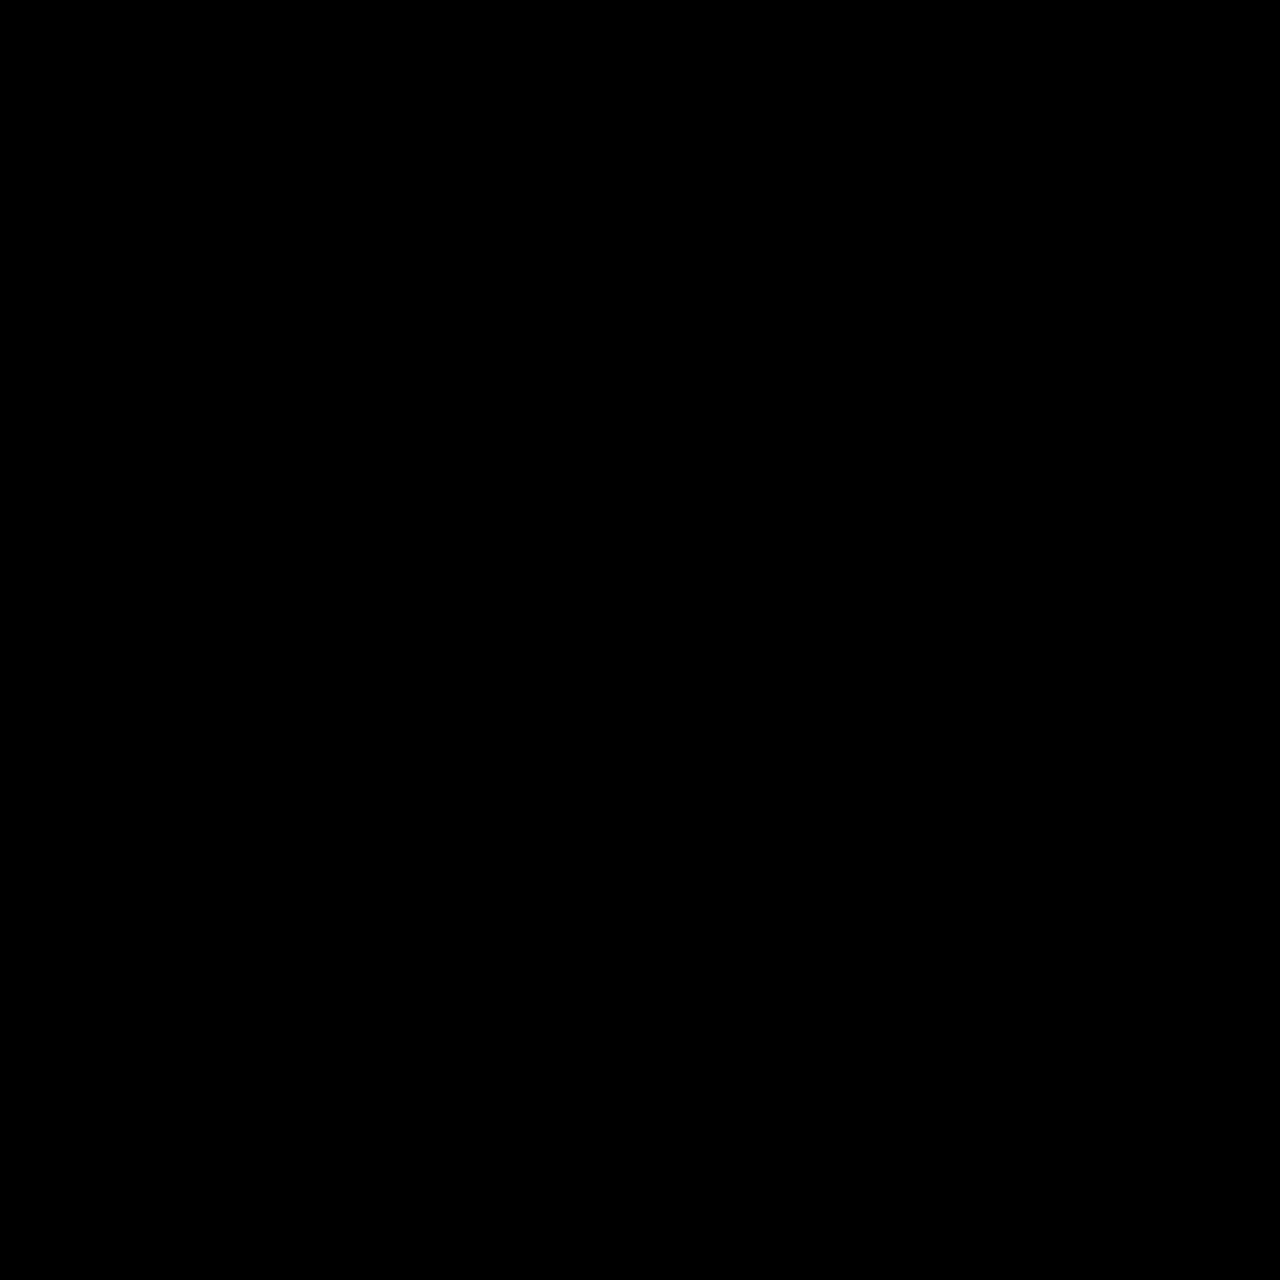 Triforce world font b. Heaven clipart tattoo design gates